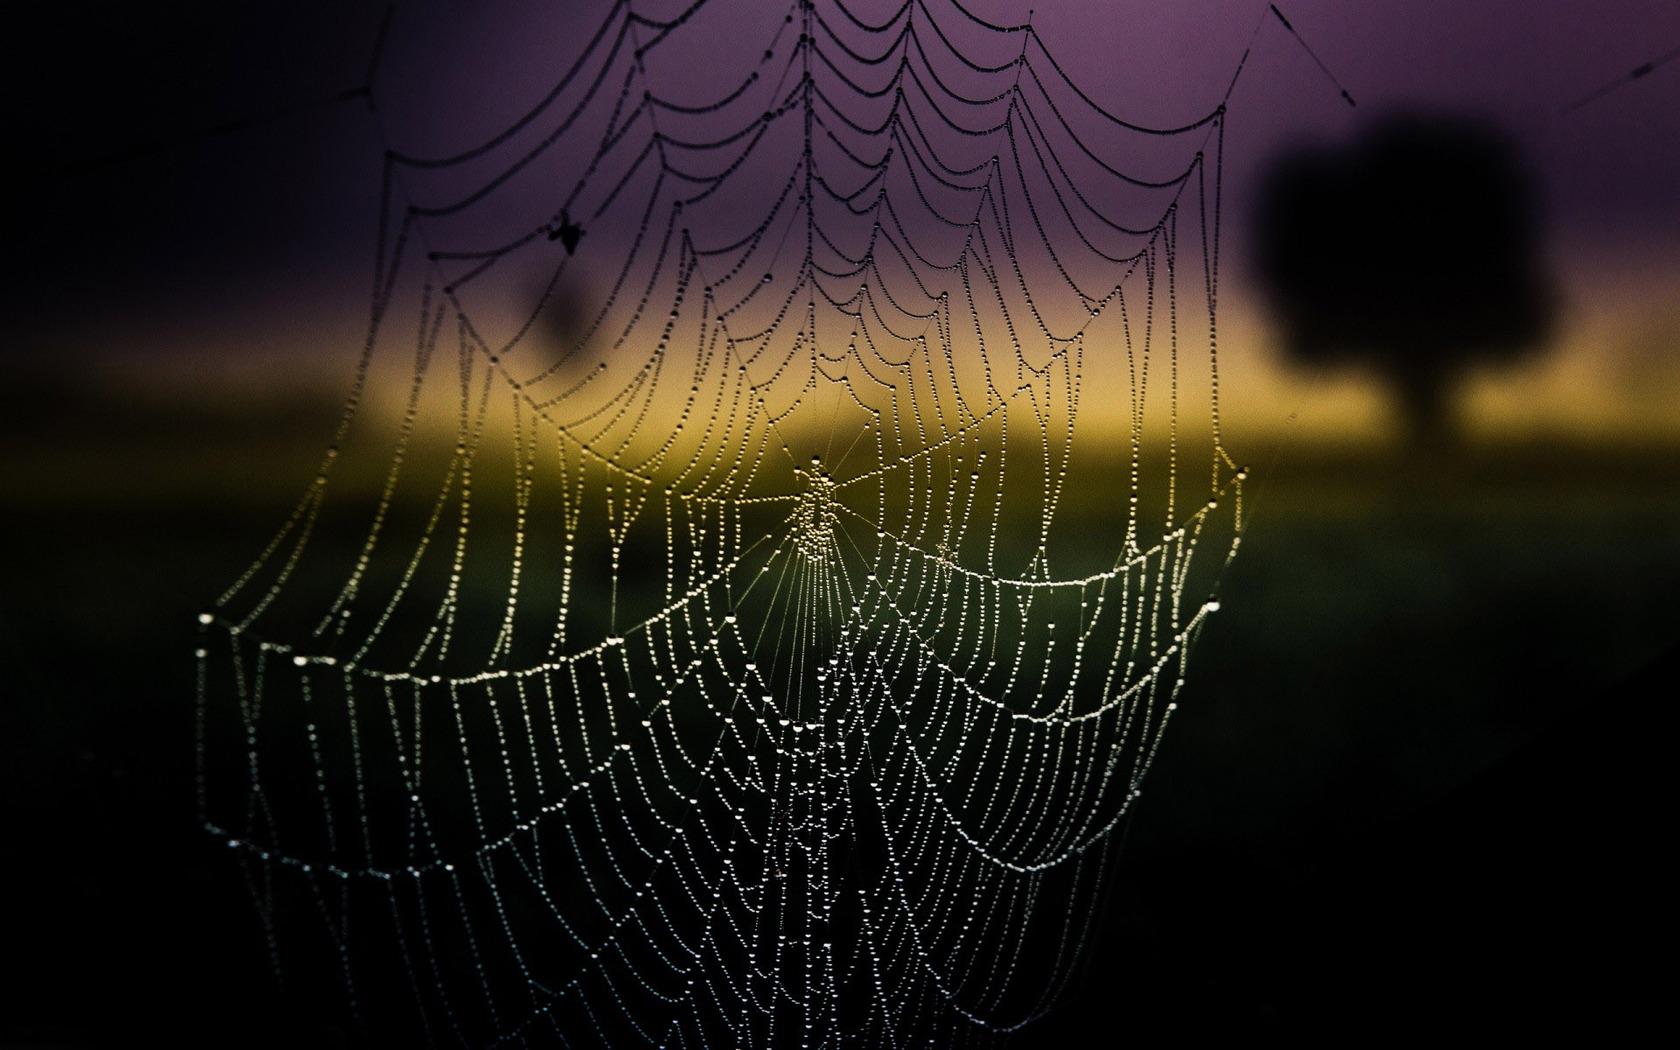 Wet spider web wallpaper 11774 1680x1050